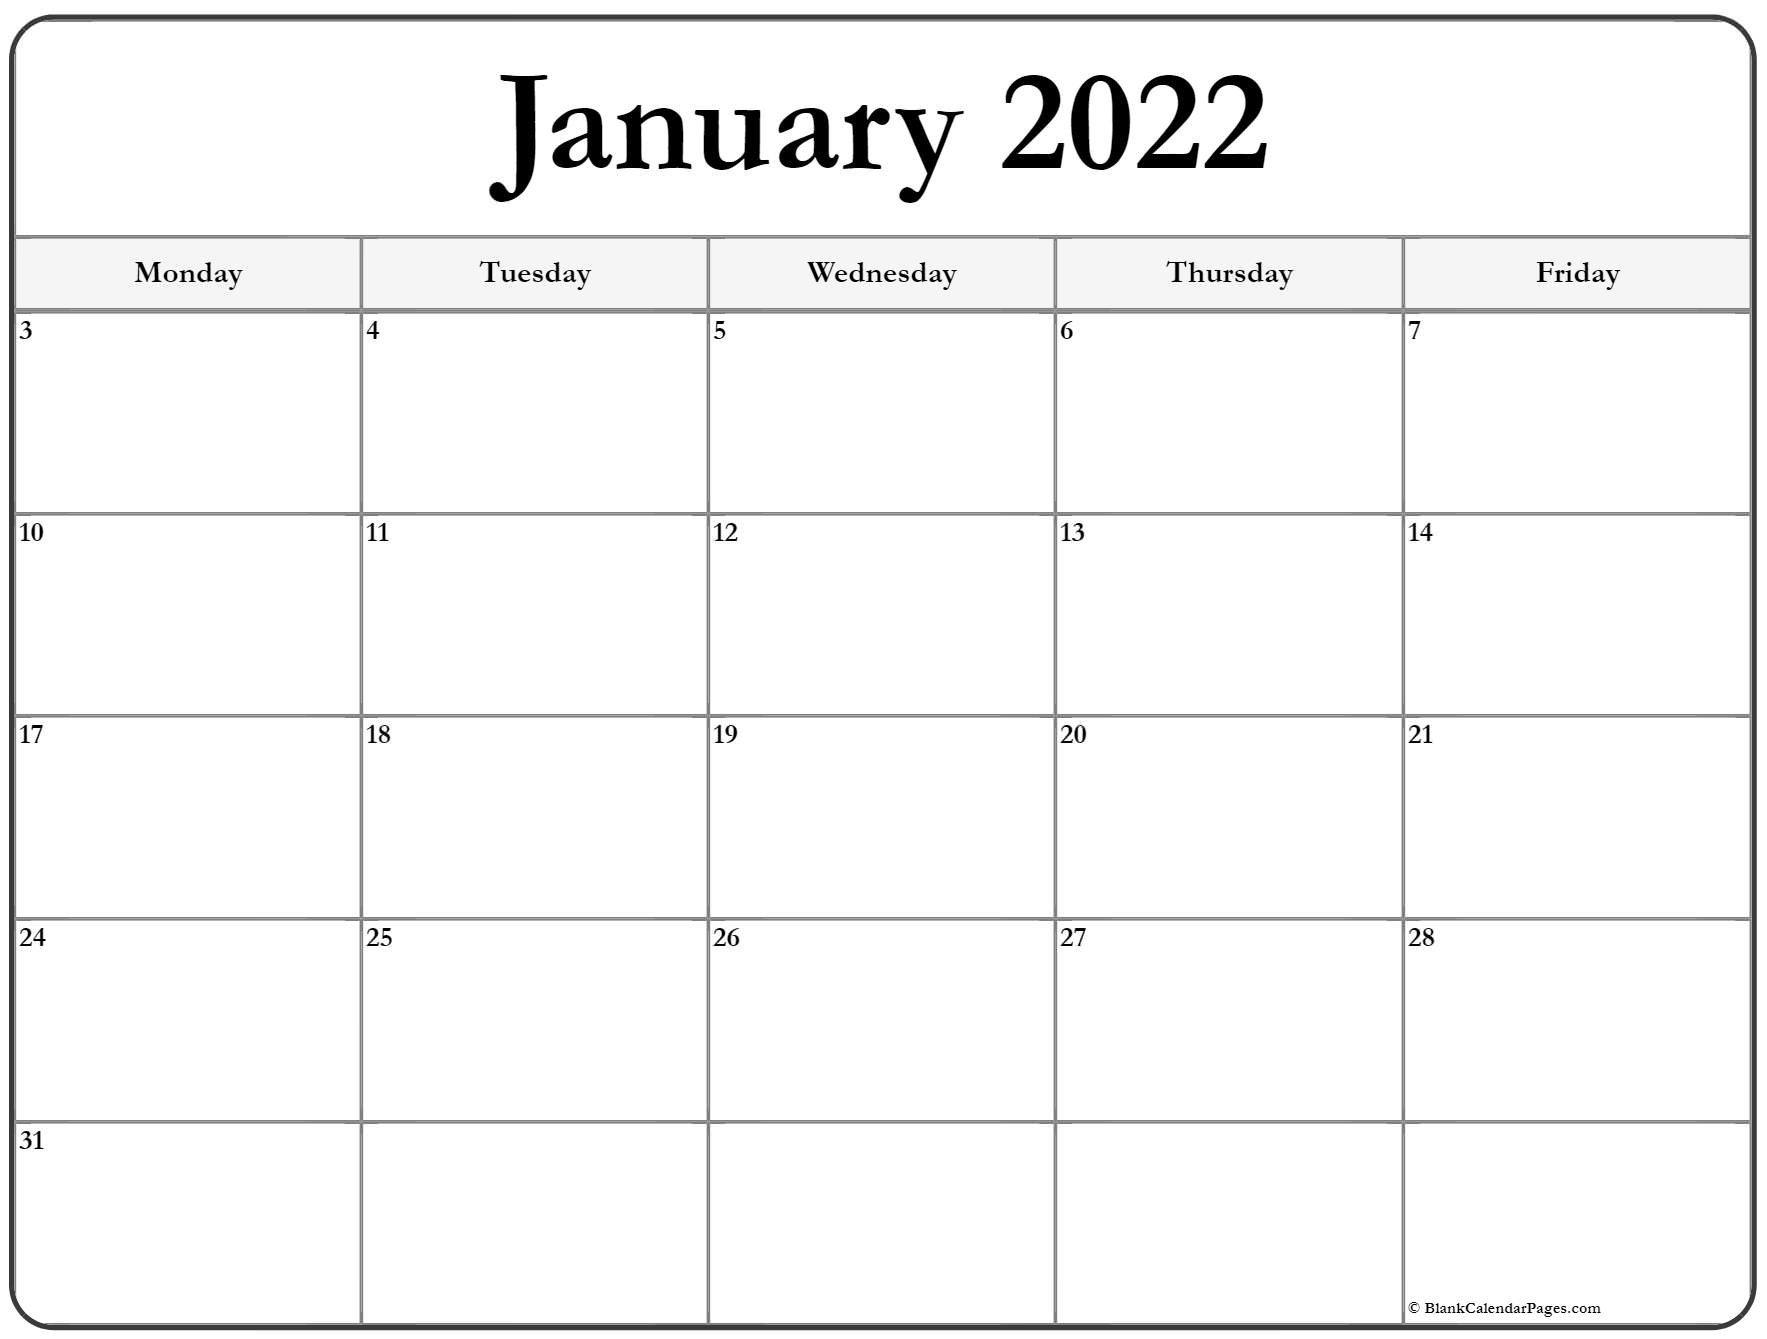 January 2022 Monday Calendar | Monday To Sunday Monday Through Friday Free Printable Calendar